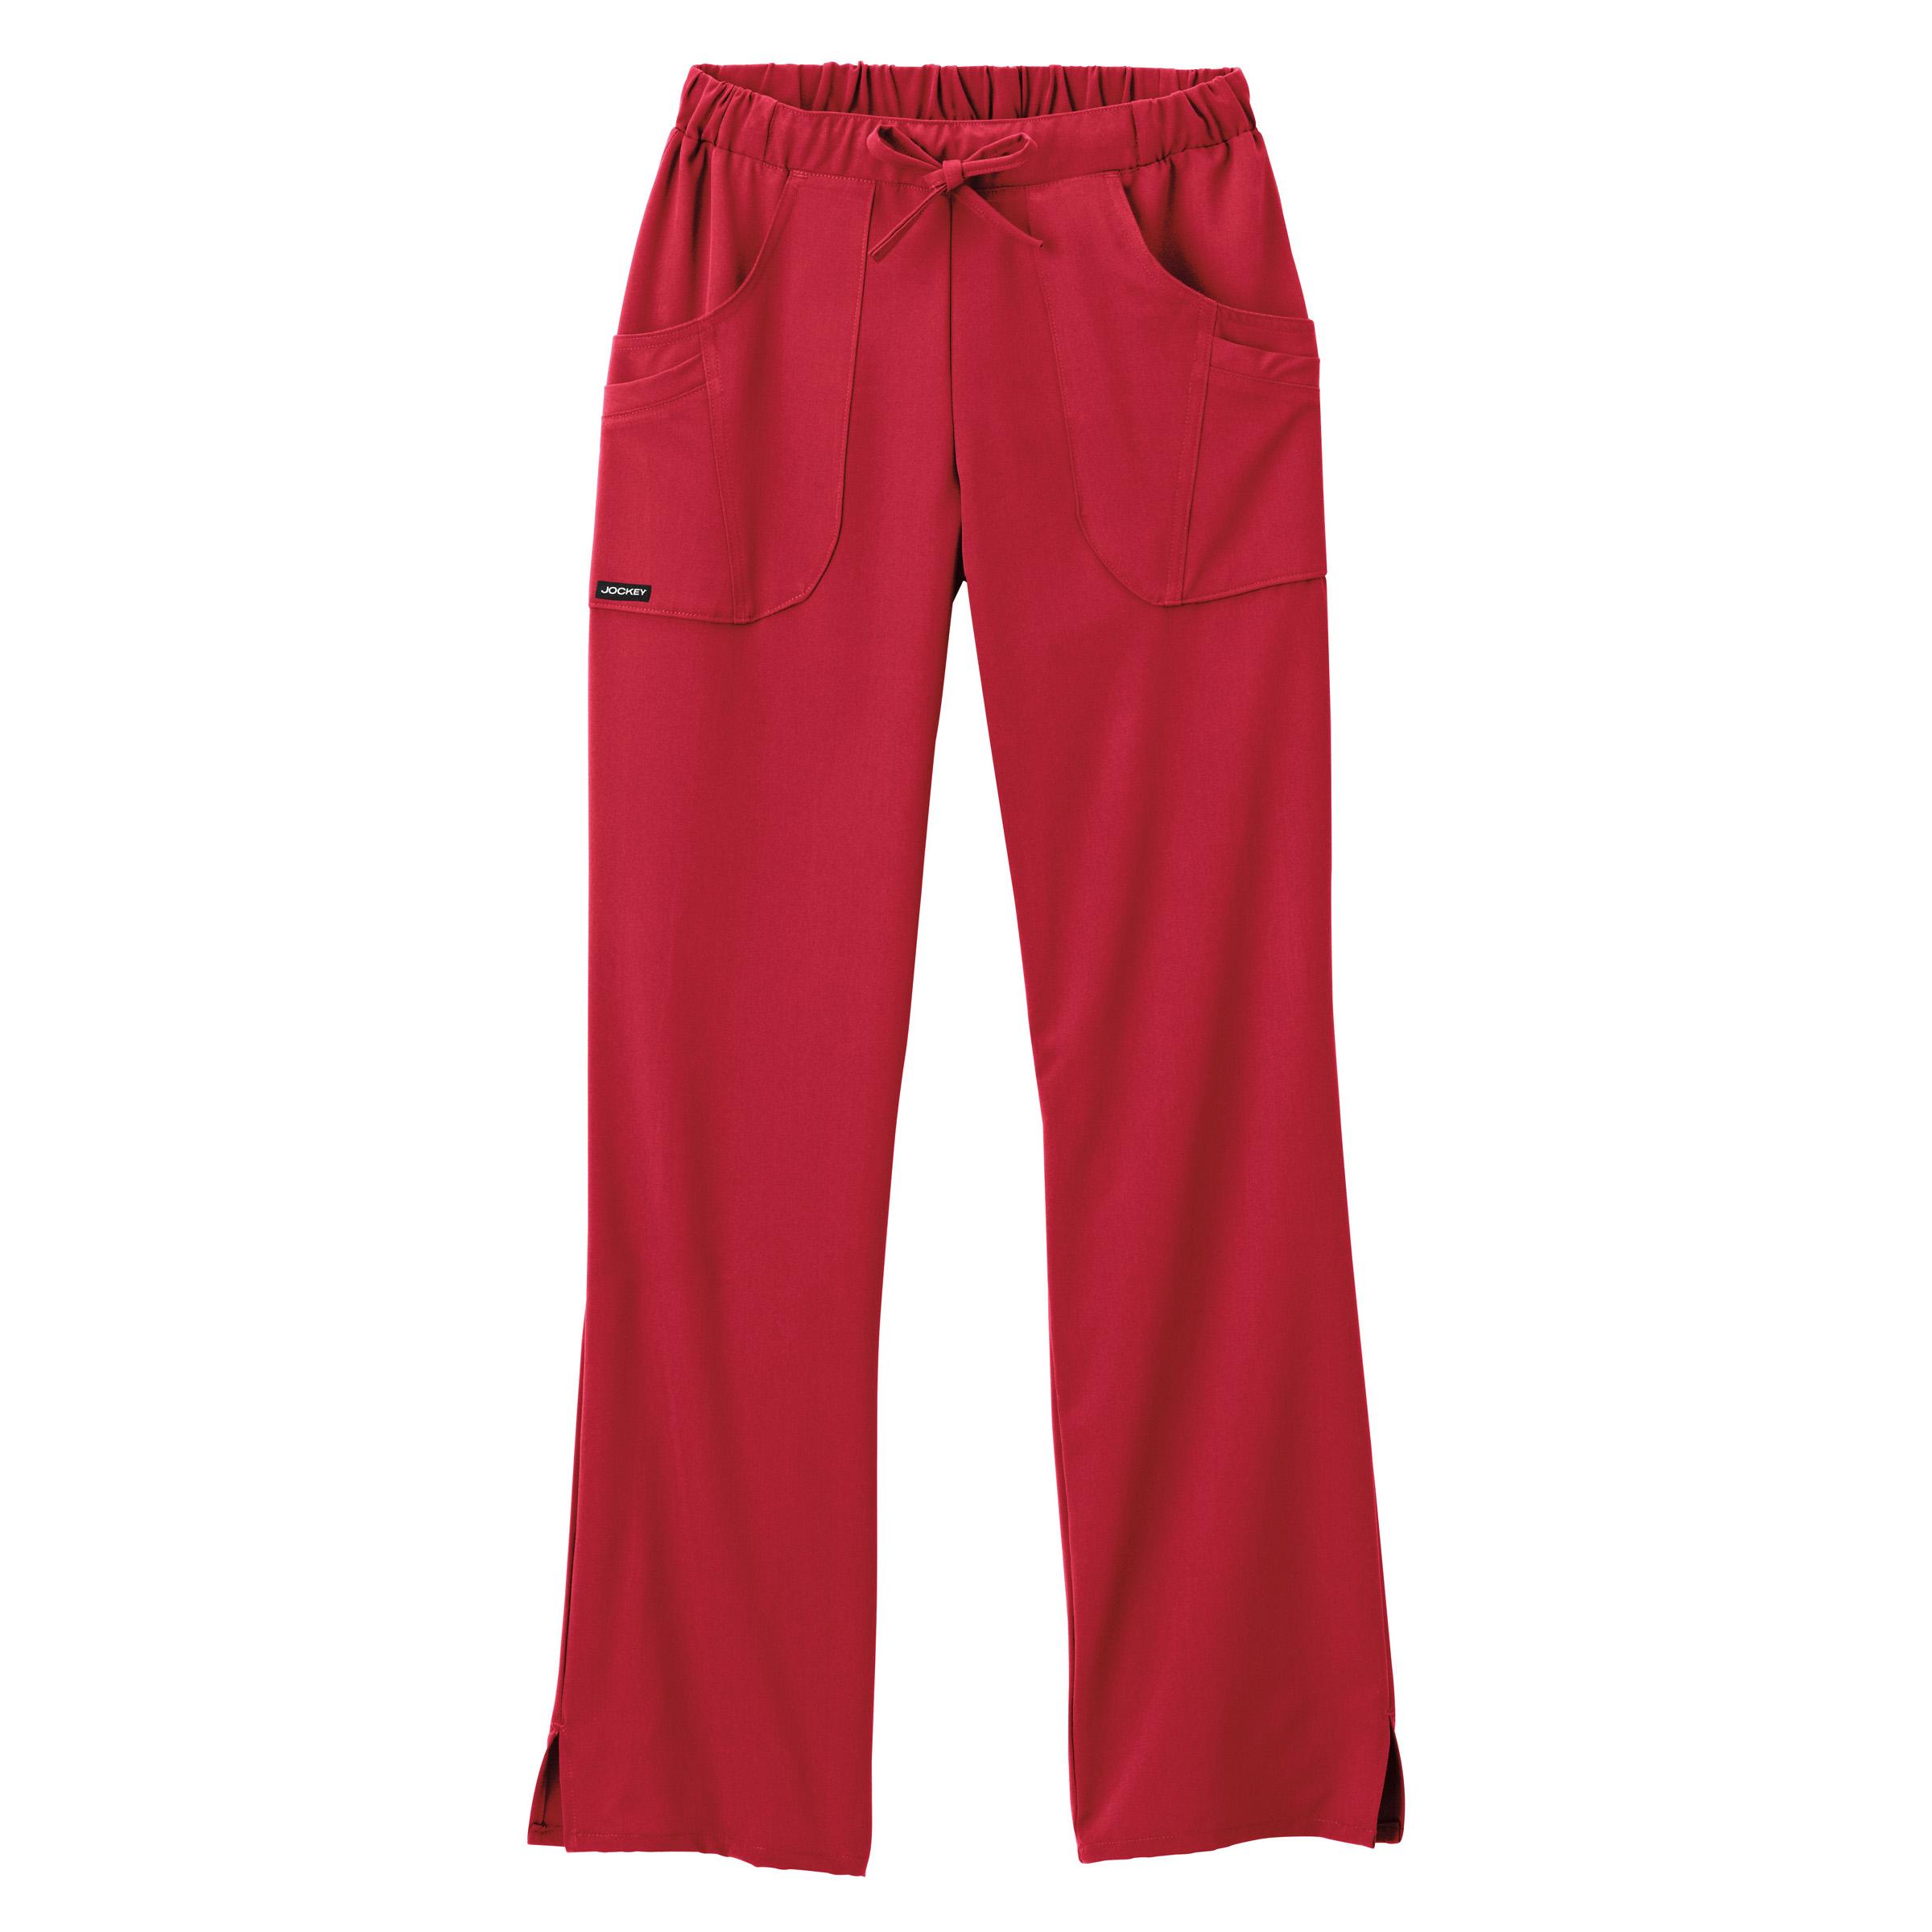 Jockey® Classic Ladies Next Generation Comfy Pant 2377